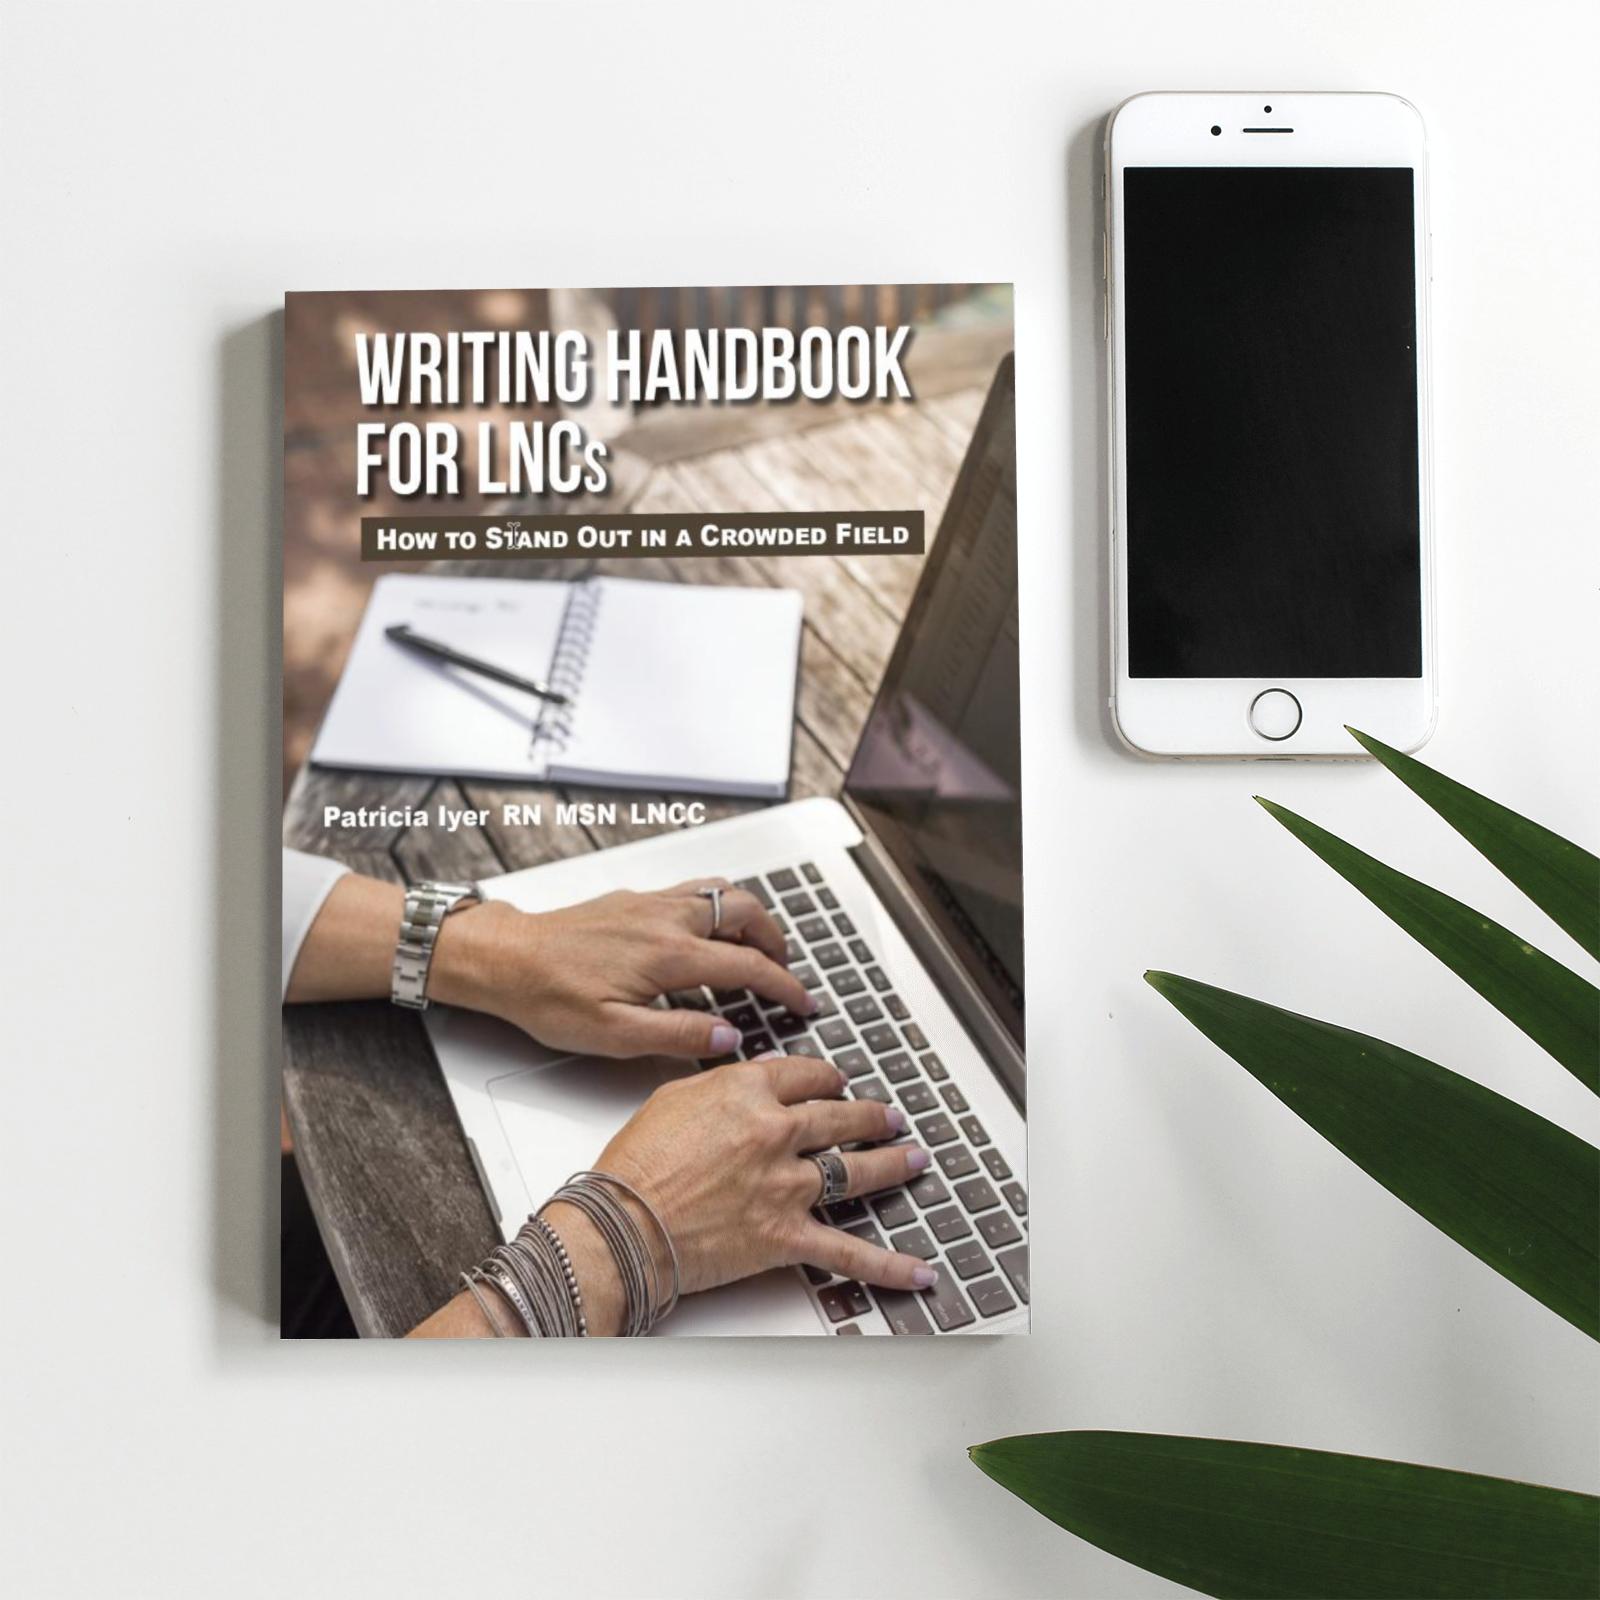 Writing handbook Mockup